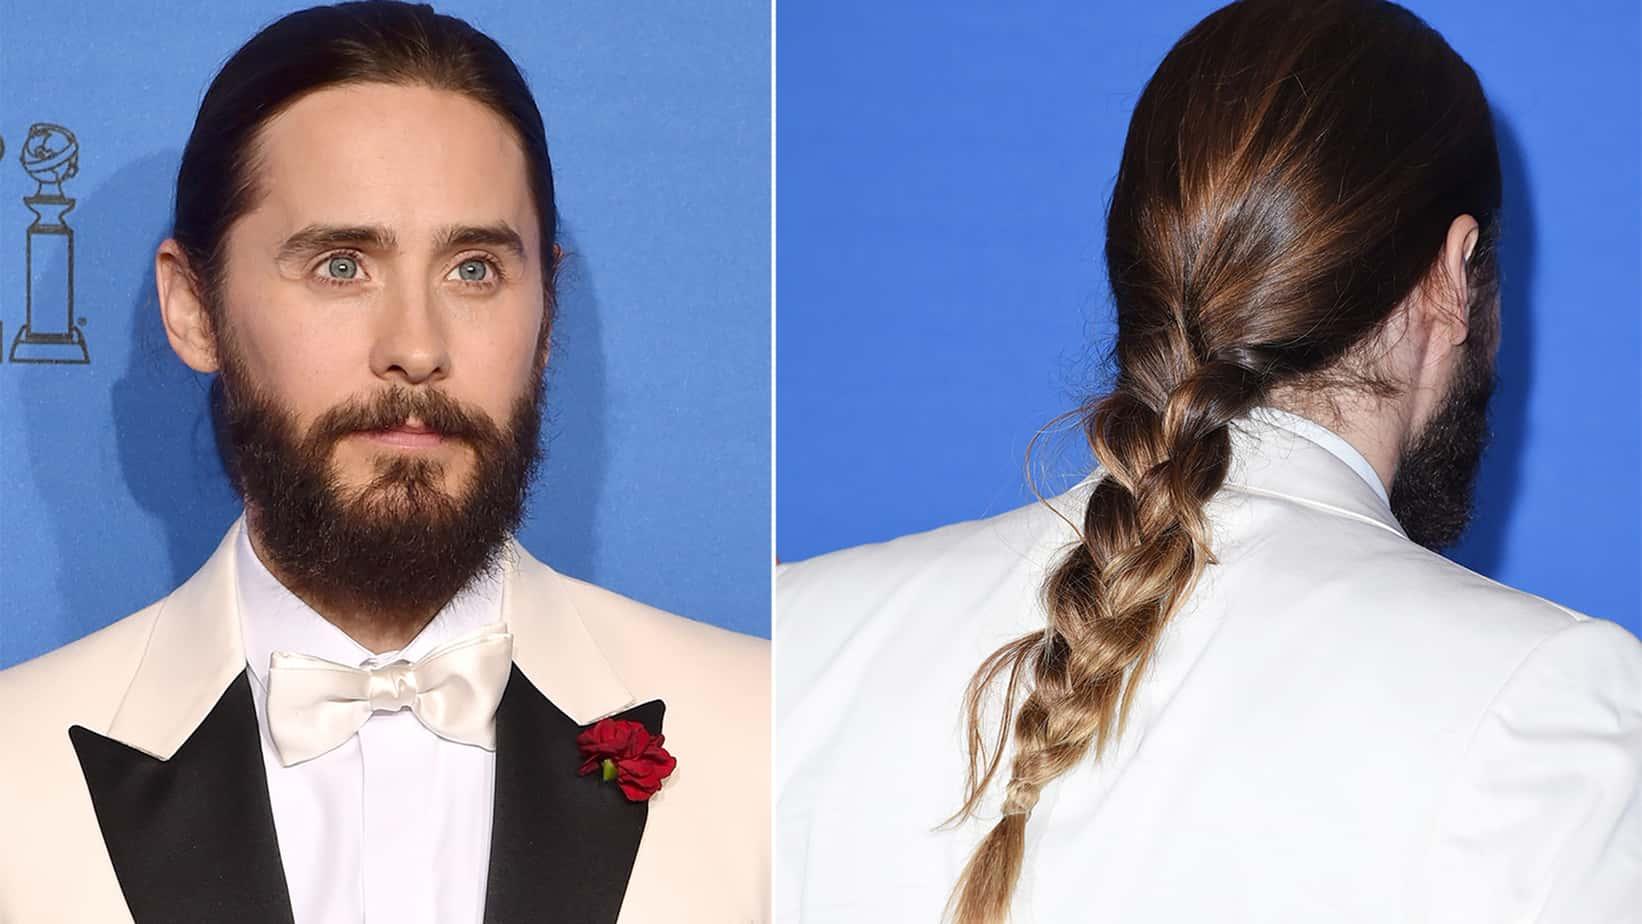 Mens-braided-hairstyles-mens-hairstyles-2017-hair-trends-2017-hairstyles-2017